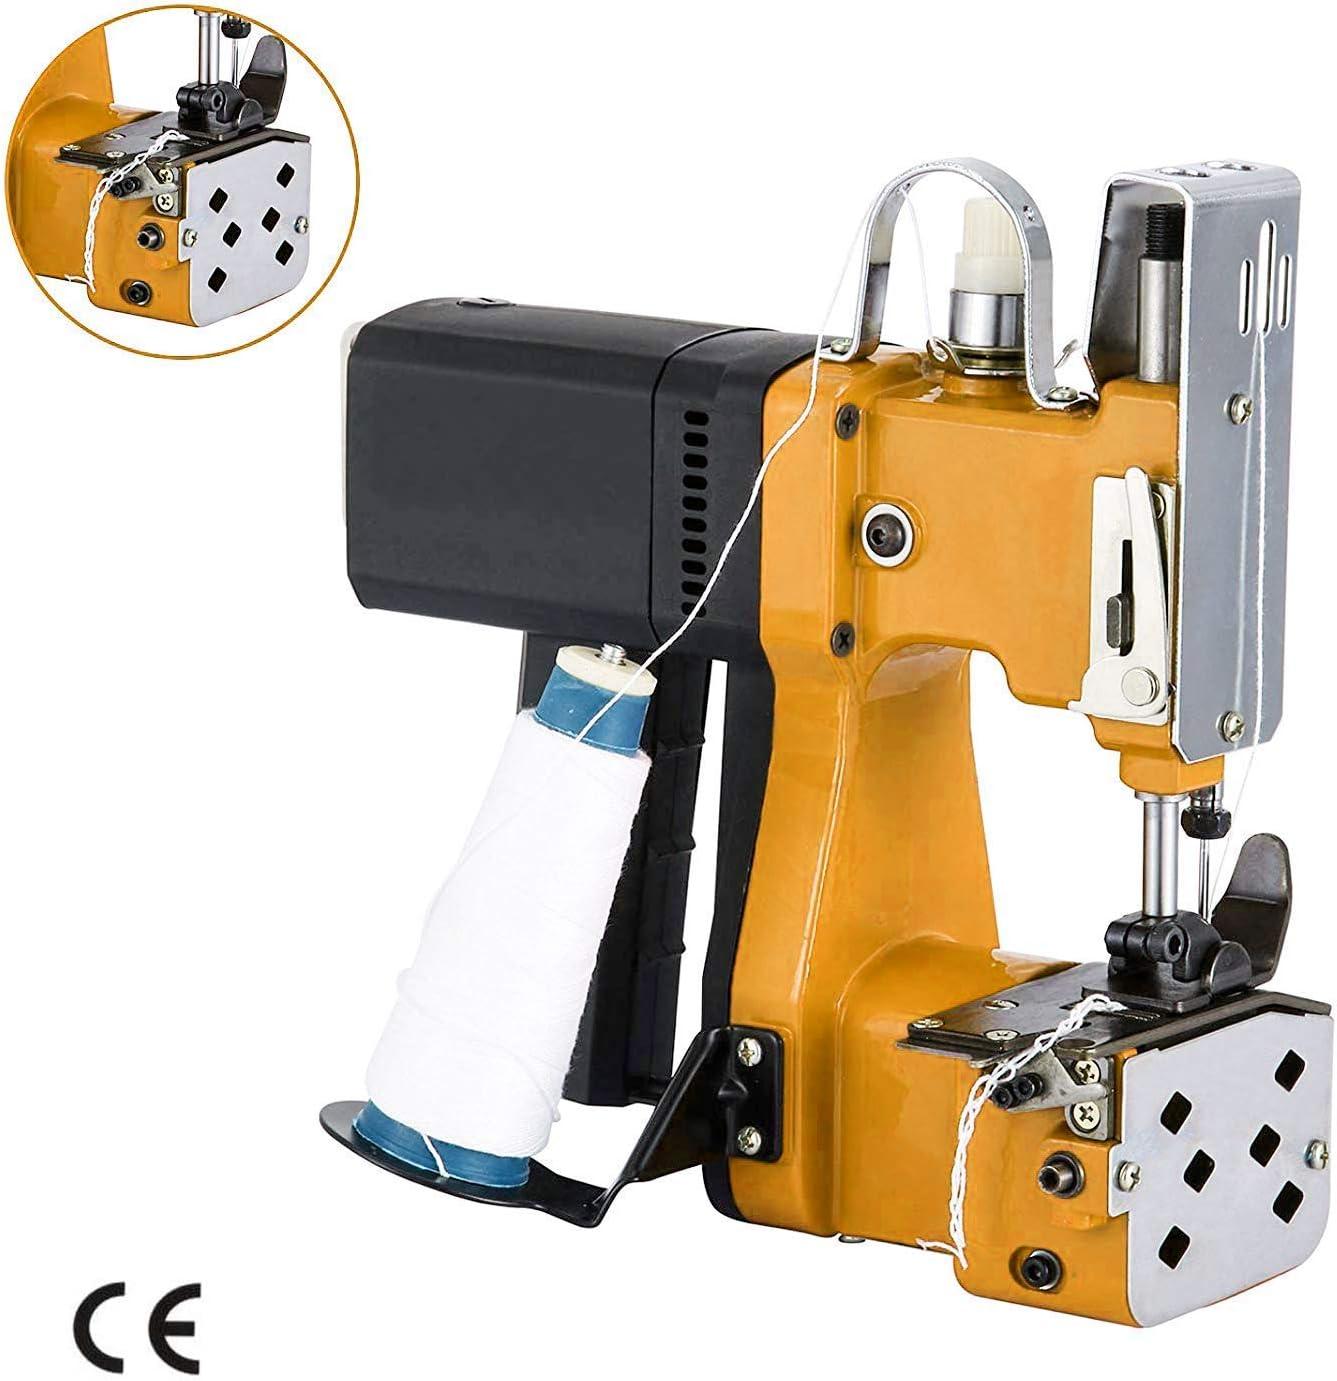 4YANG Máquina de coser portátil Máquina de coser más cerca Saco ...